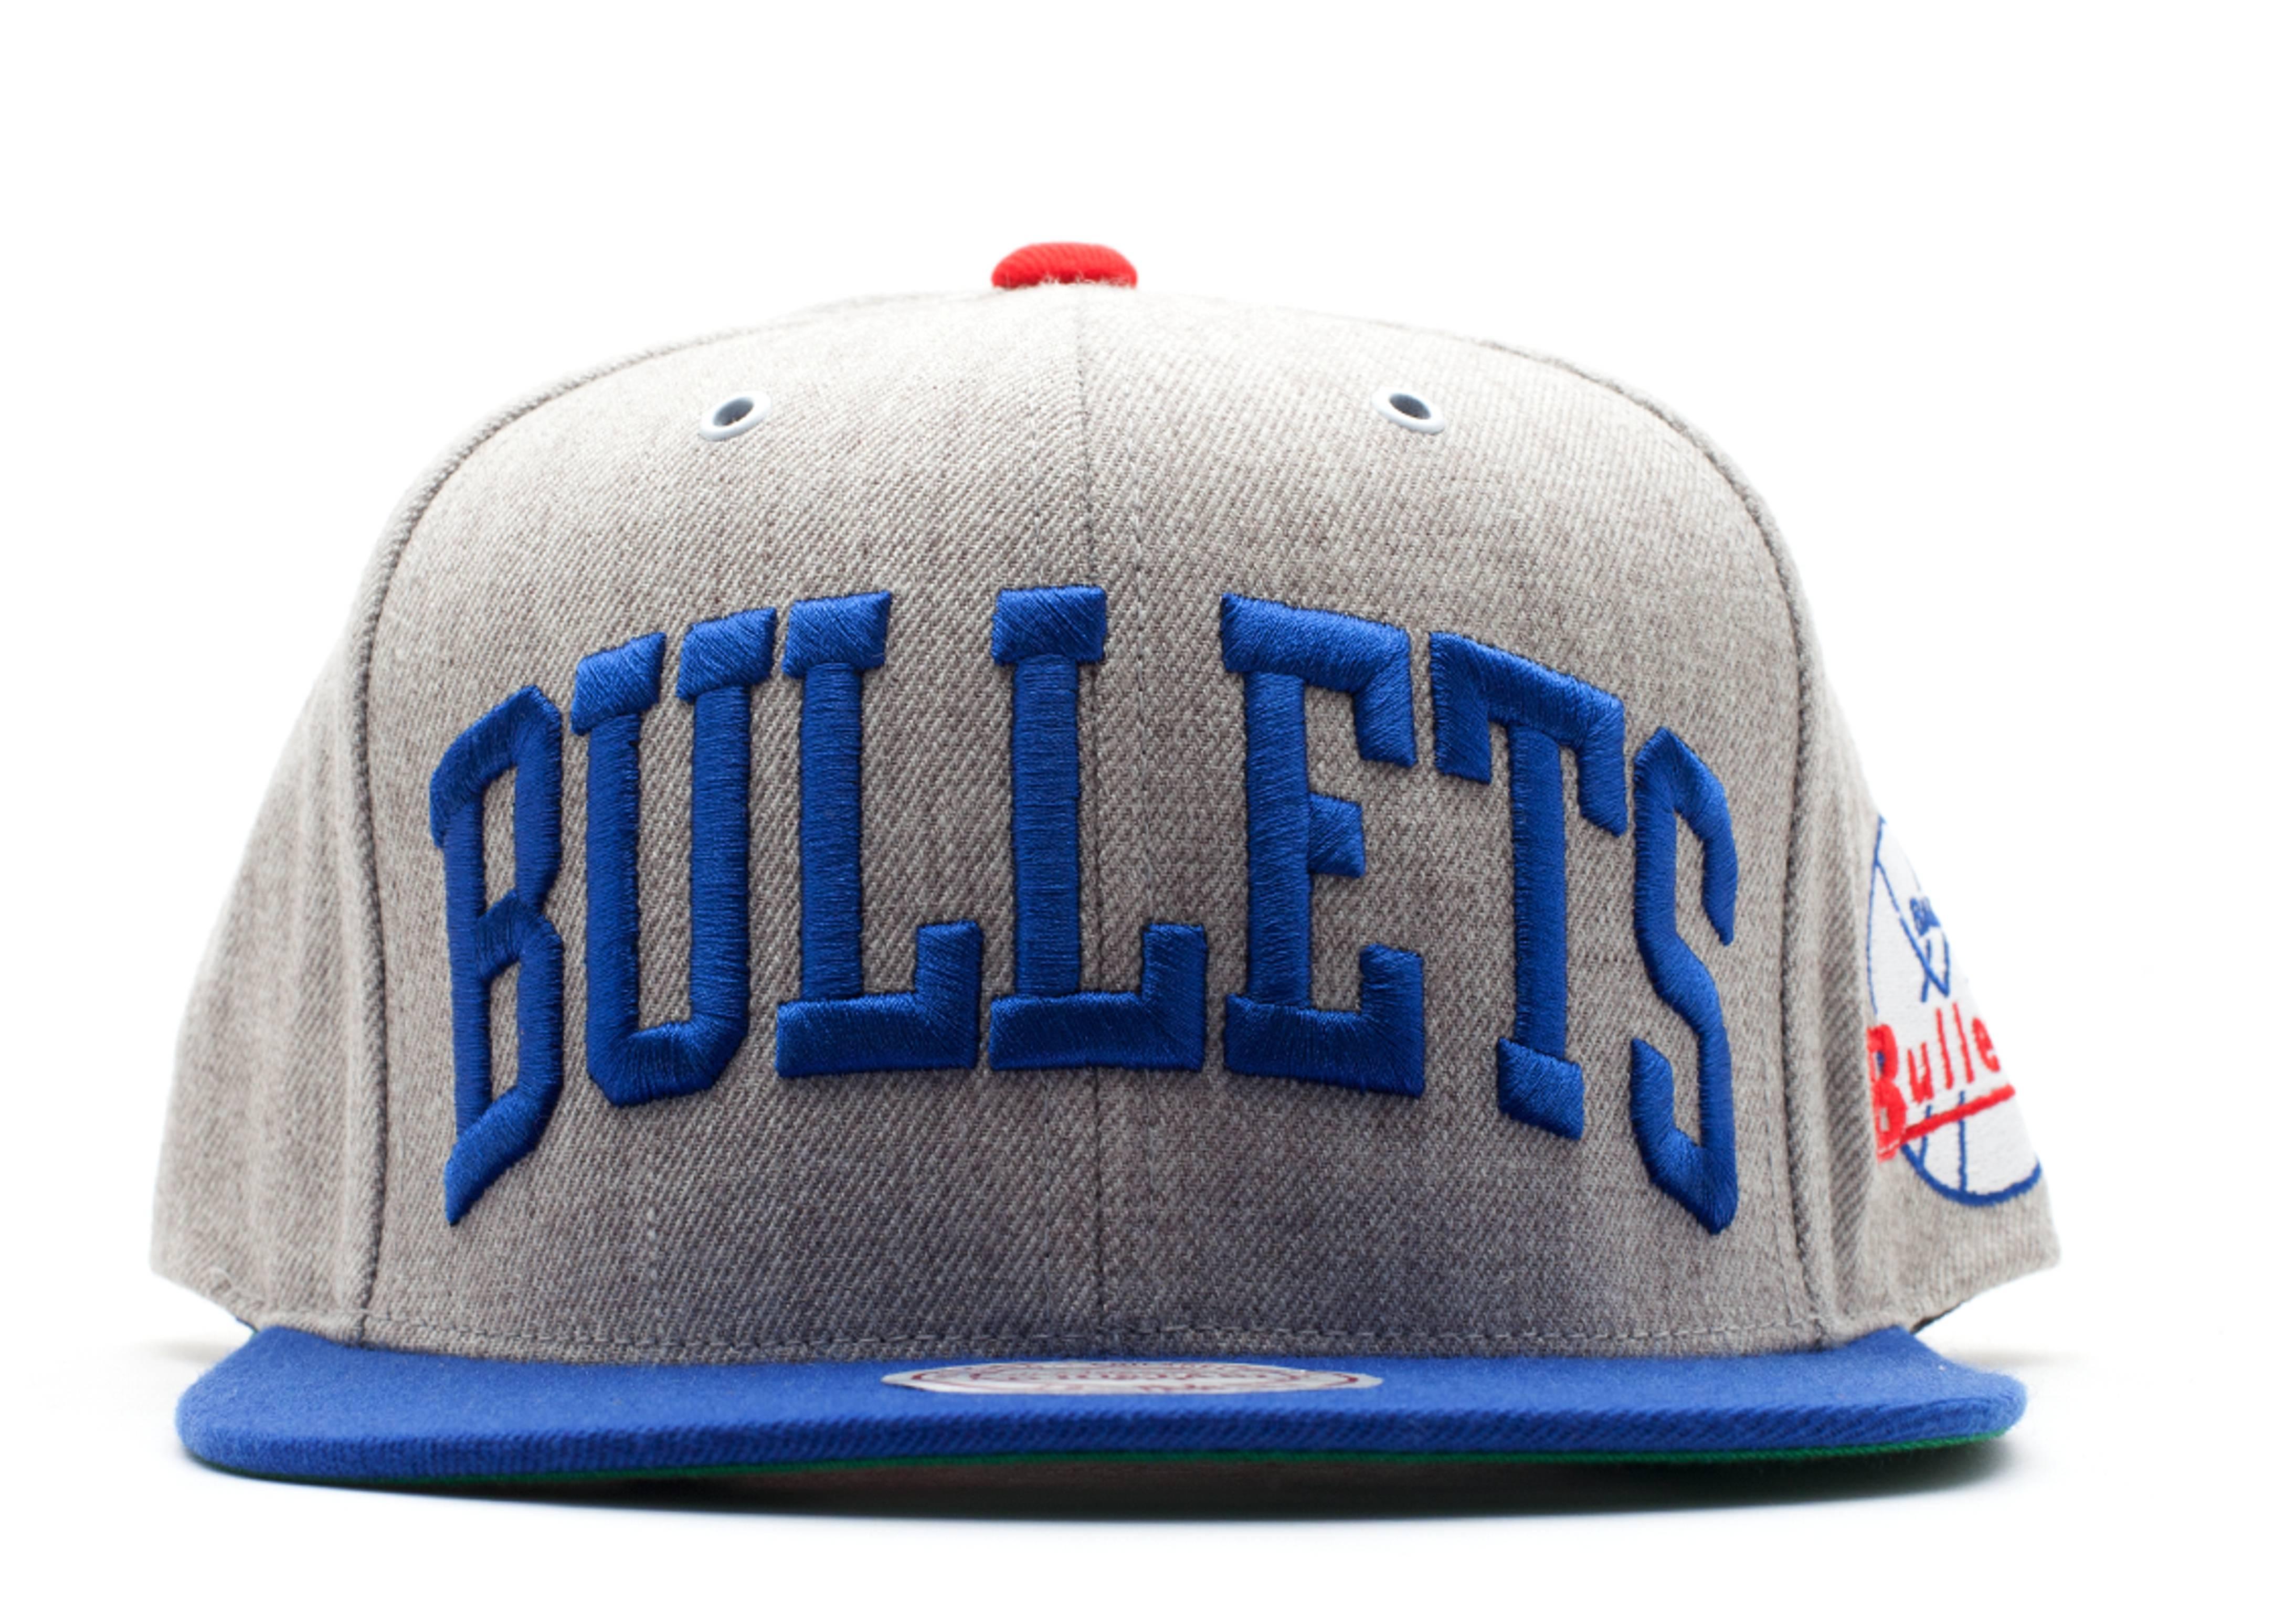 baltimore bullets snap-back